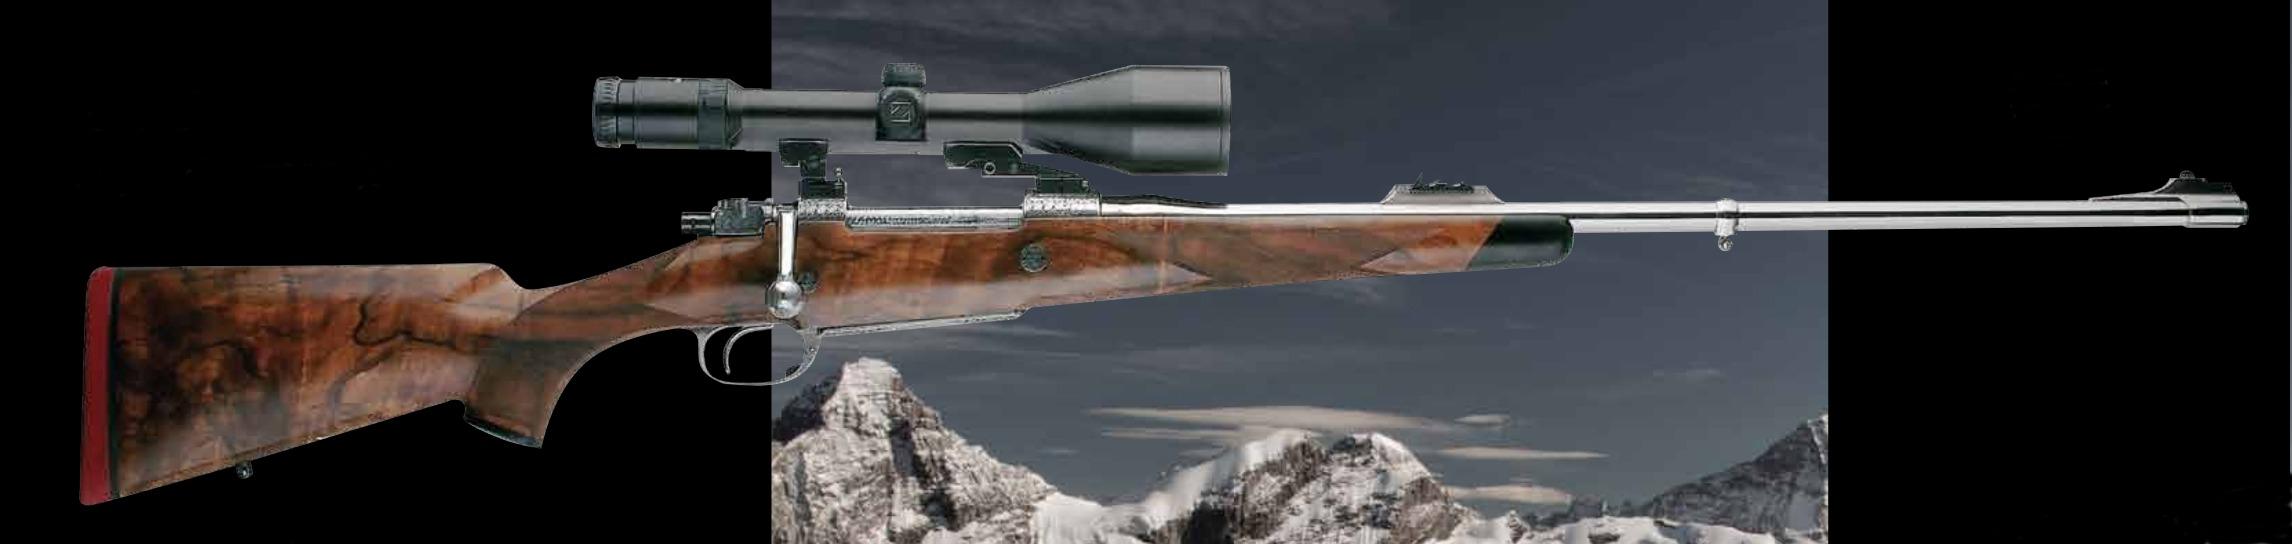 Grulla Armas bolt action sporting rifle